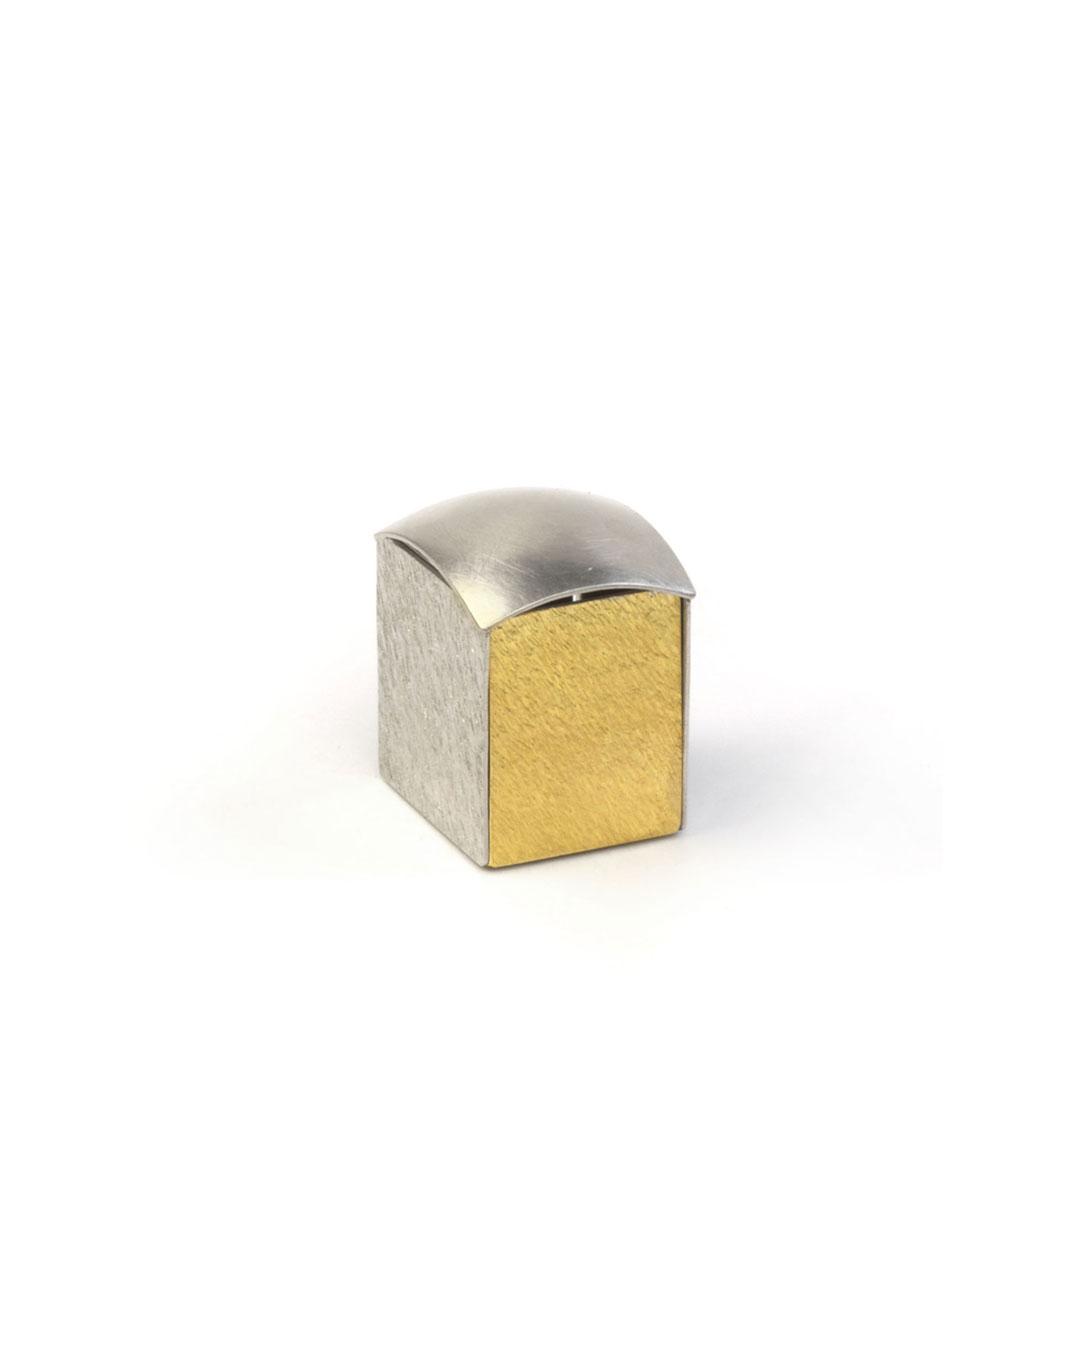 Okinari Kurokawa, untitled, 2008, ring; 970 silver, 835 gold, 23 x 20 x 17 mm